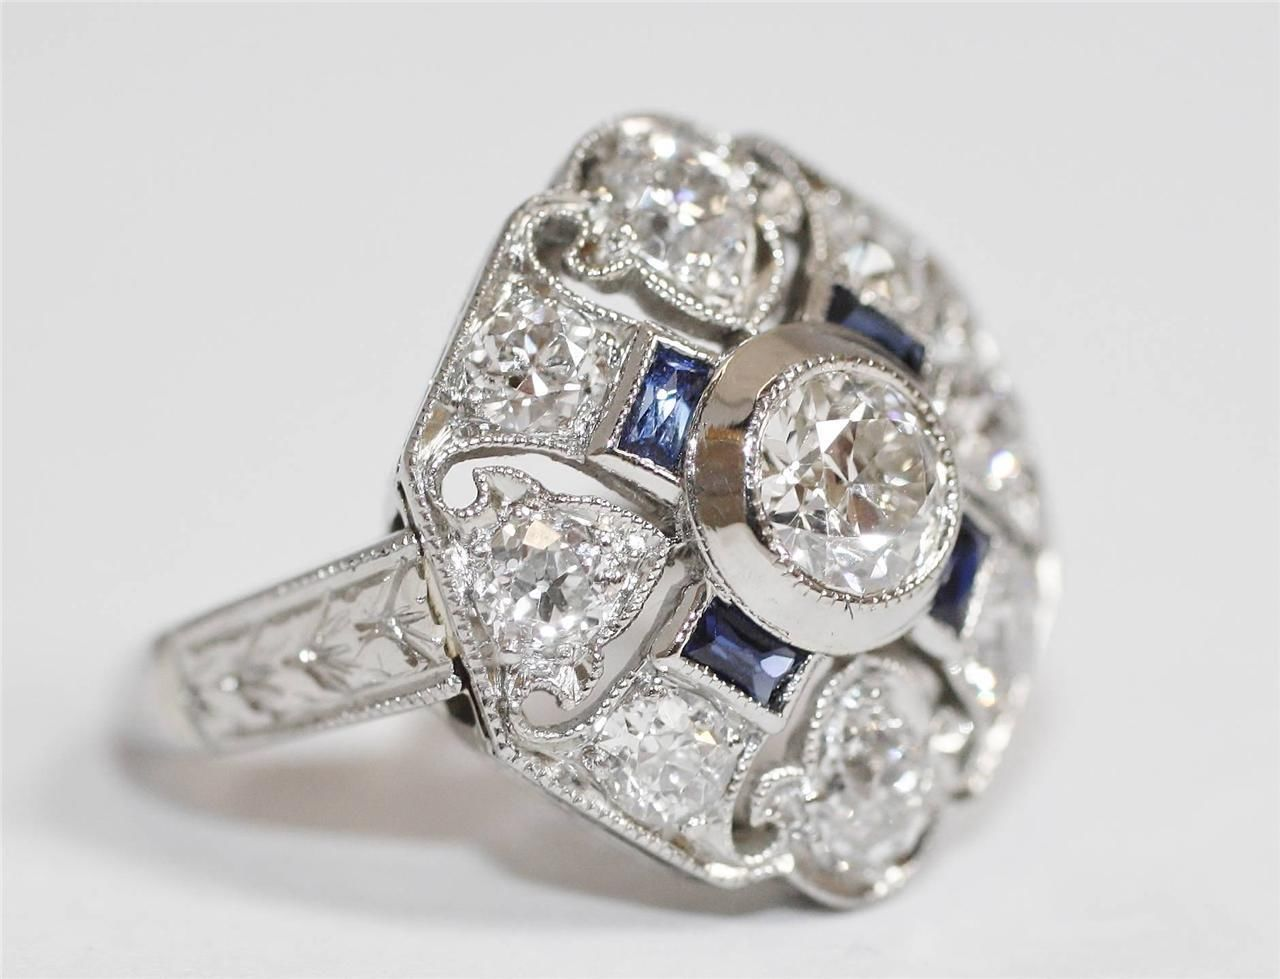 recent estate jewelry buys hemet jewelry buyers - Where To Sell Wedding Ring